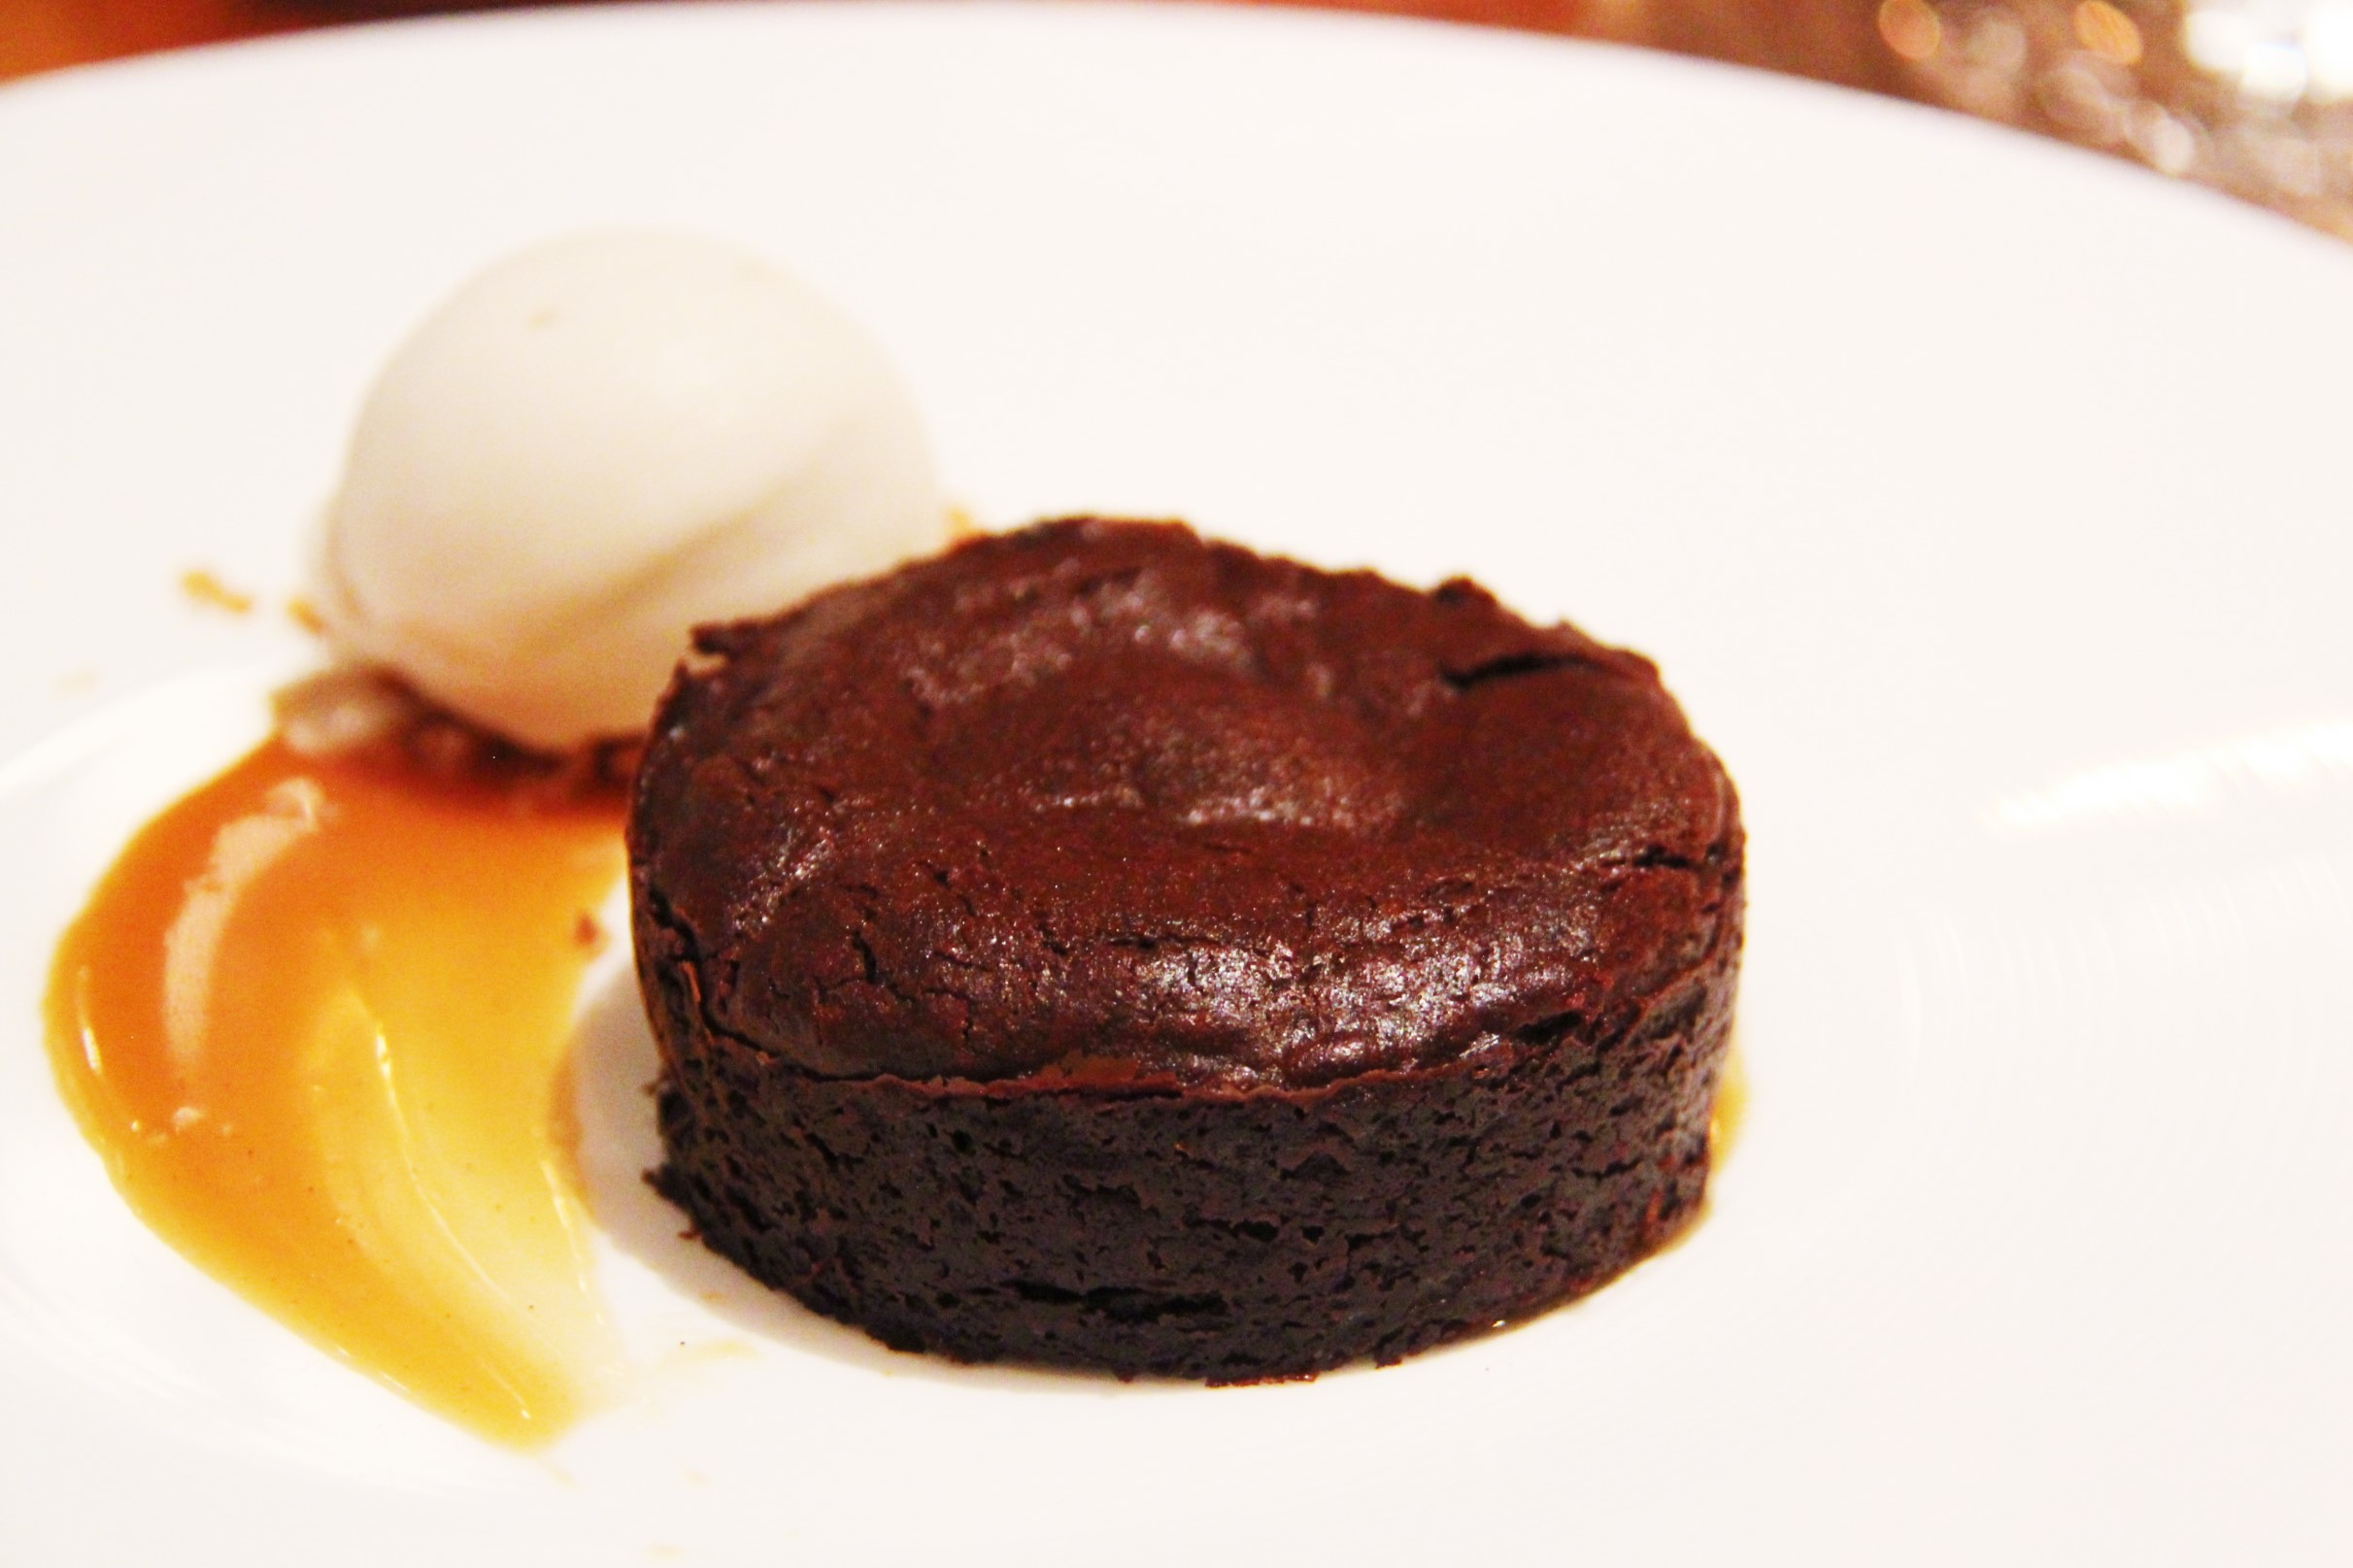 Chocolate Mousse, Espresso Caramel, Mascarpone Cream